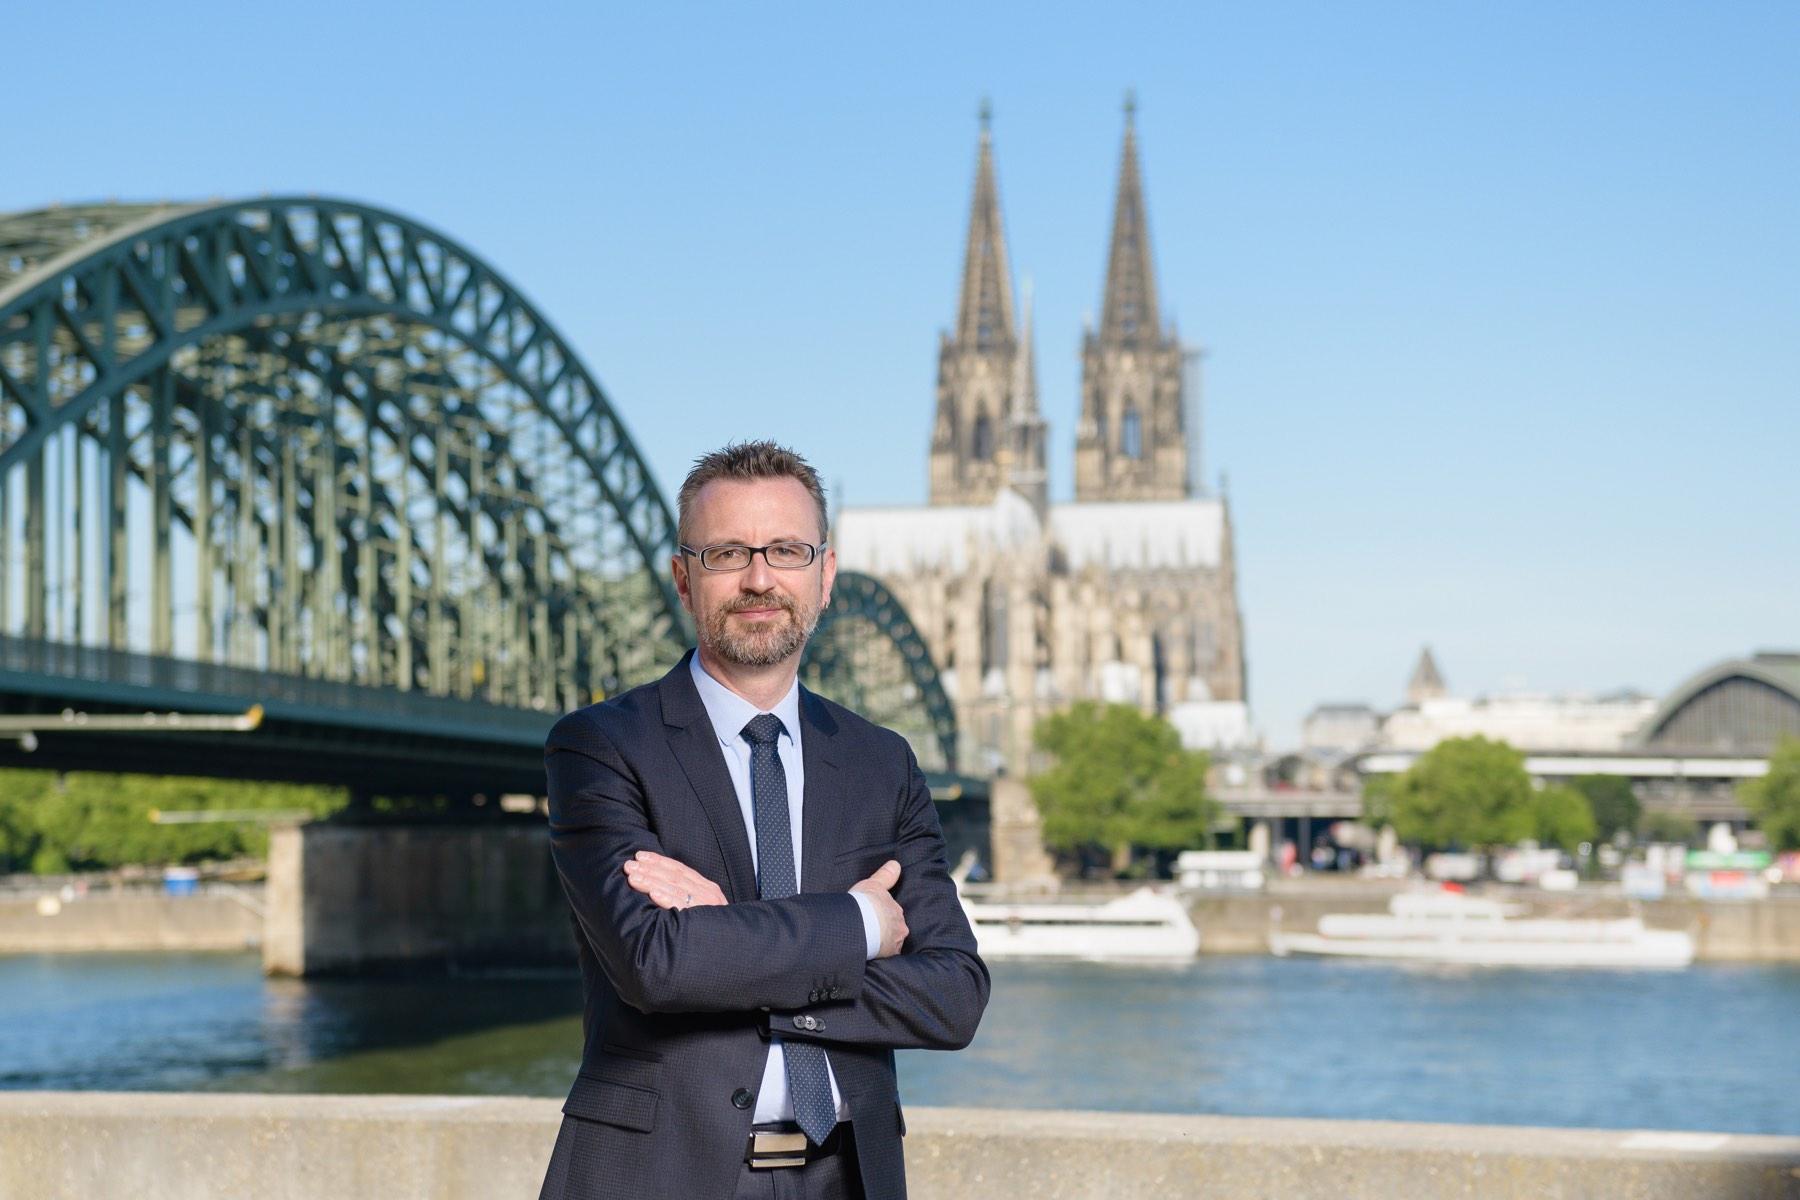 Dr. Jürgen Martin Amann